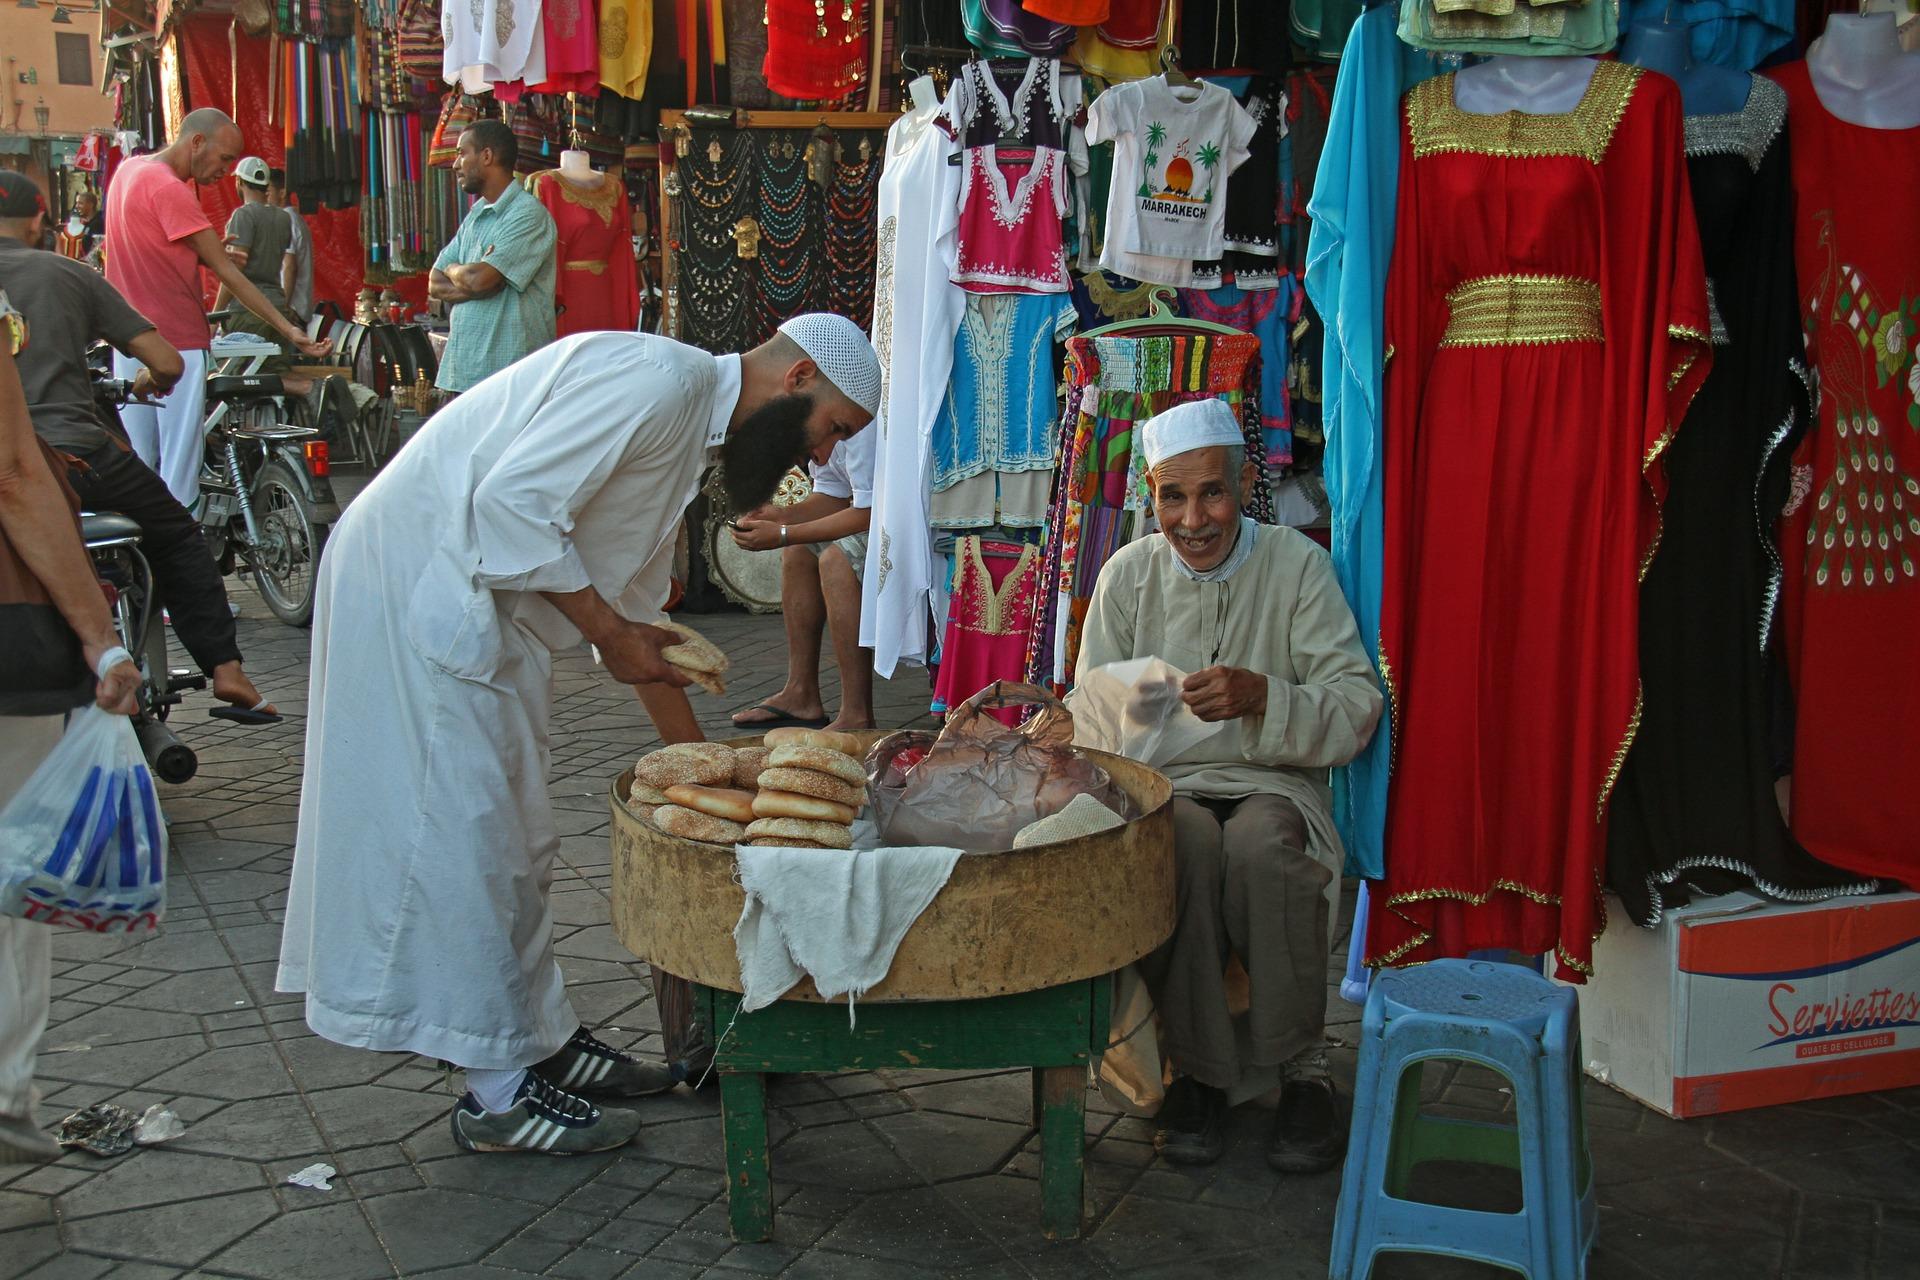 Arab men speaking to each other in market in Morocco